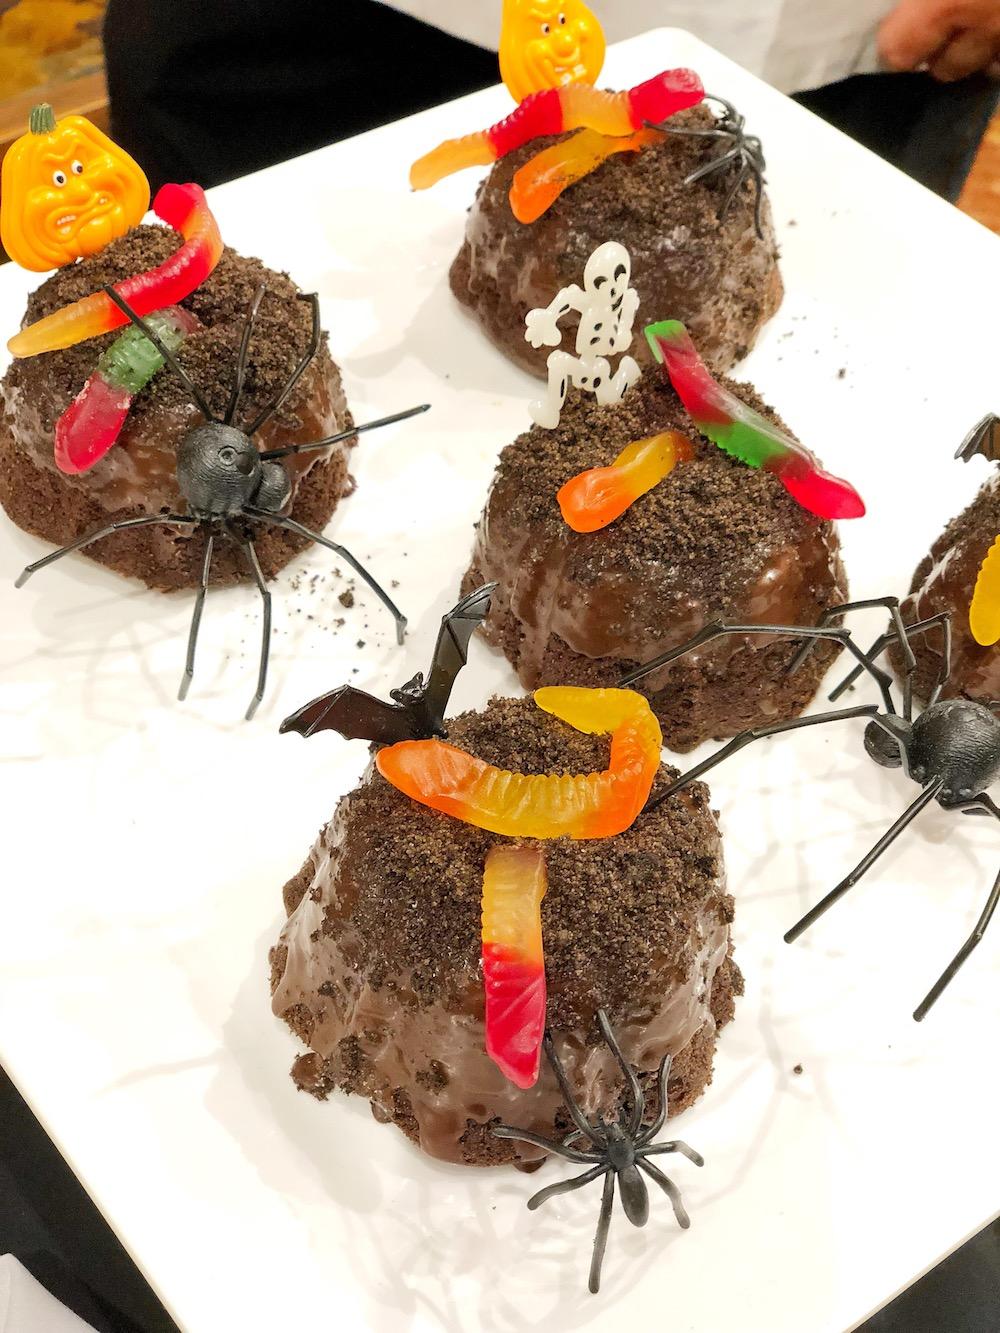 Mini chocolate bundt cakes. Get it during Knott's Scary Farm | livingmividaloca.com | #scaryfarm #knottsberryfarm #flaminghotcheetos #themepark #amusementpark #familytravel #california #southerncalifornia